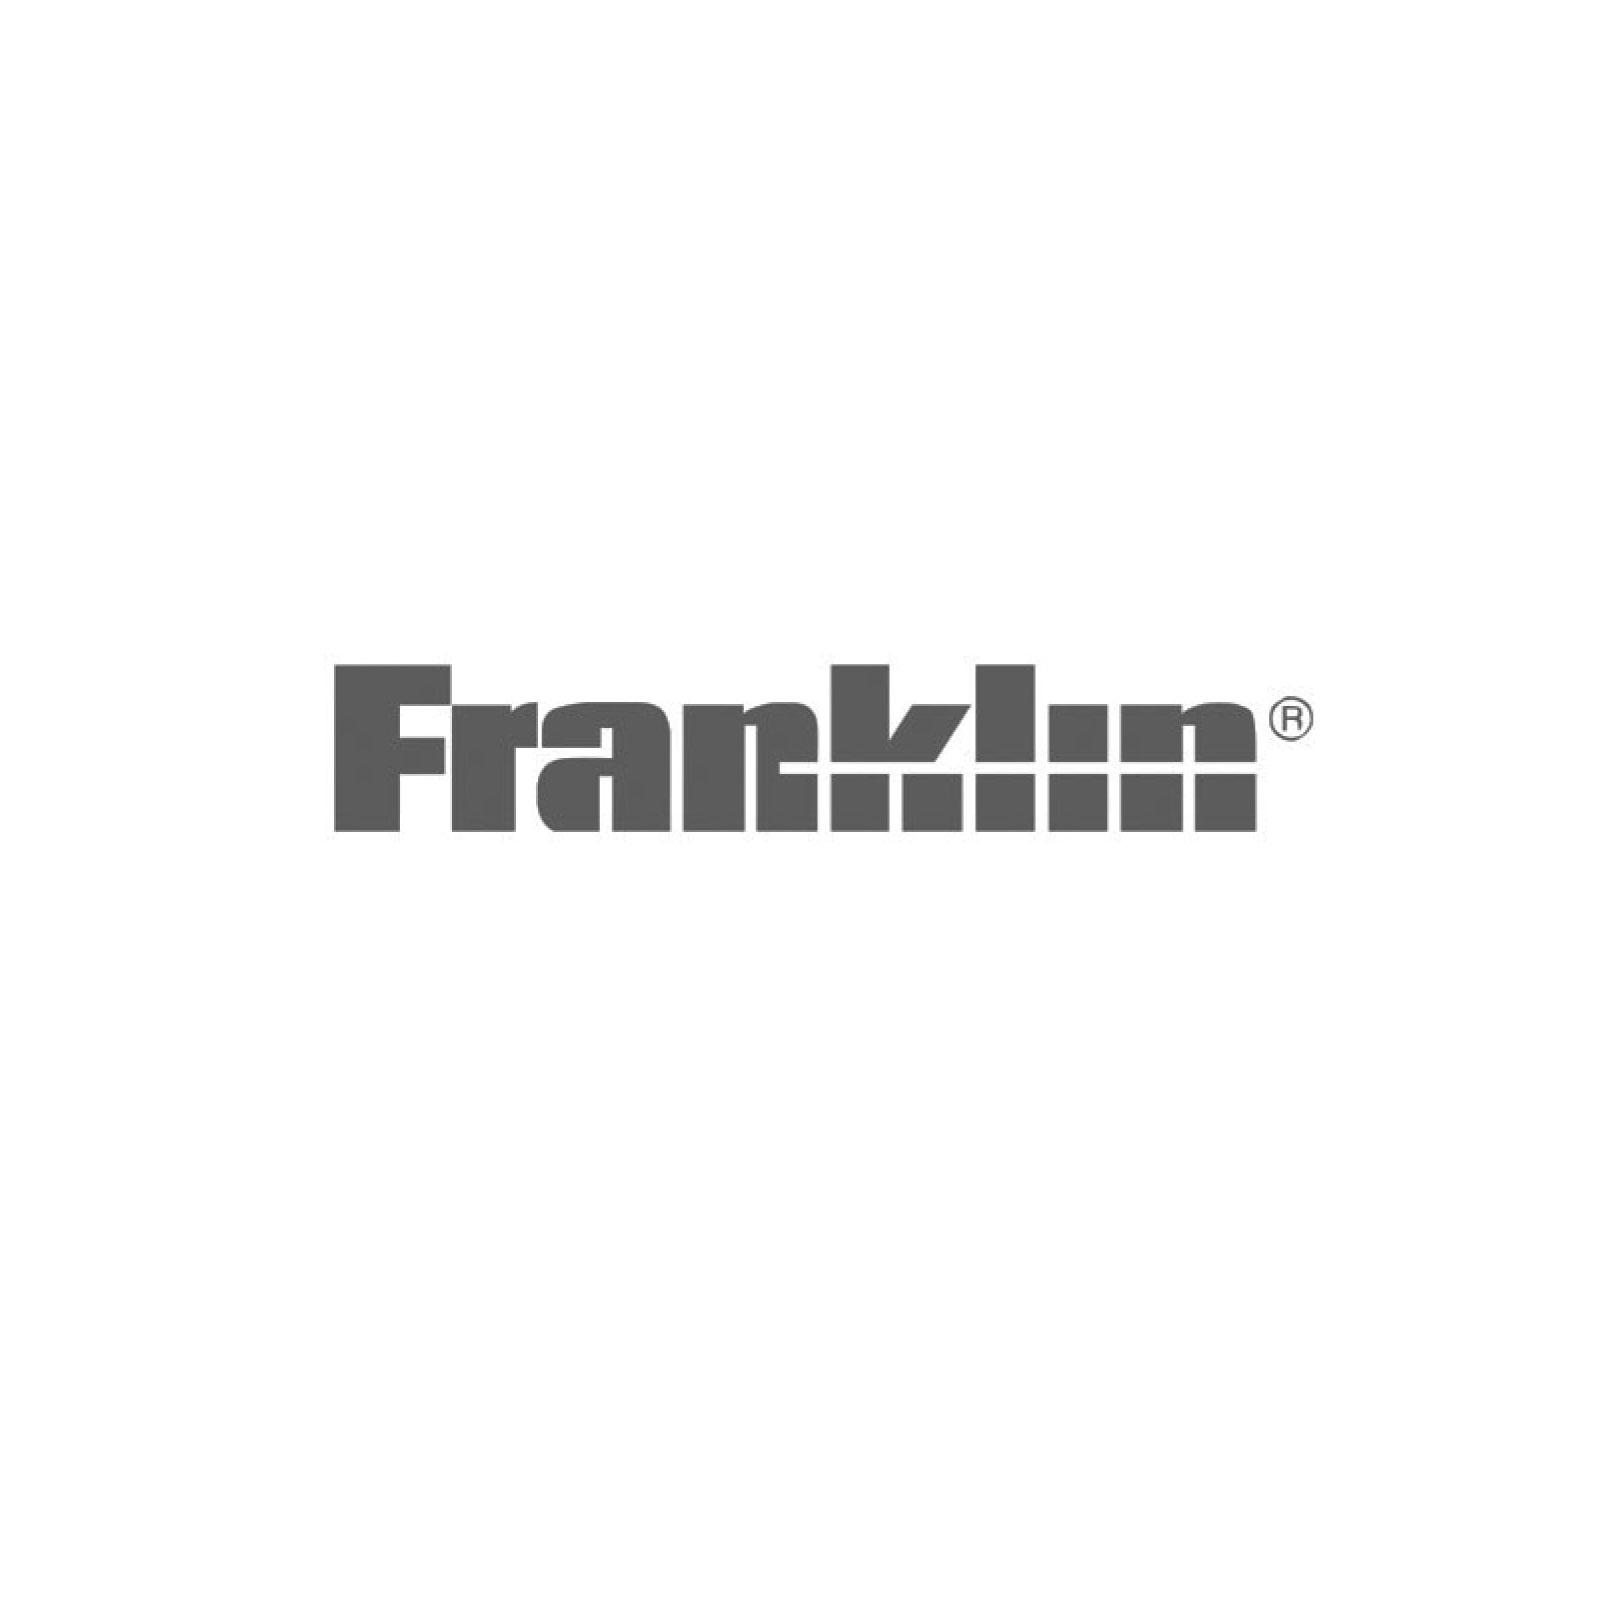 Franklin Electronics